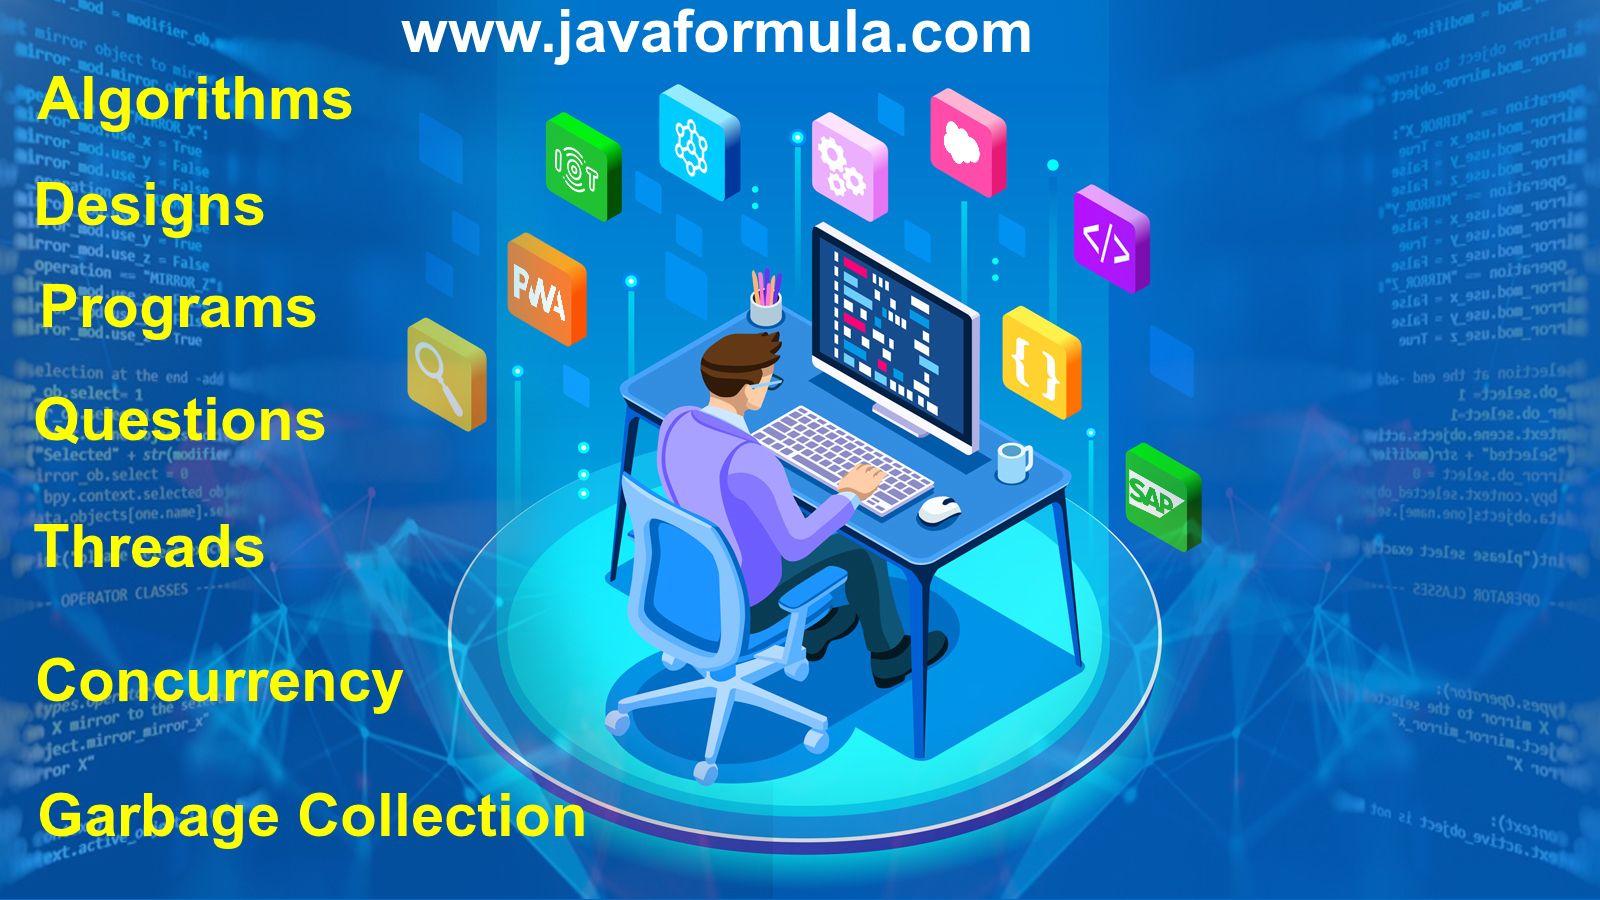 Javaformula Com Software Development Development Software Projects